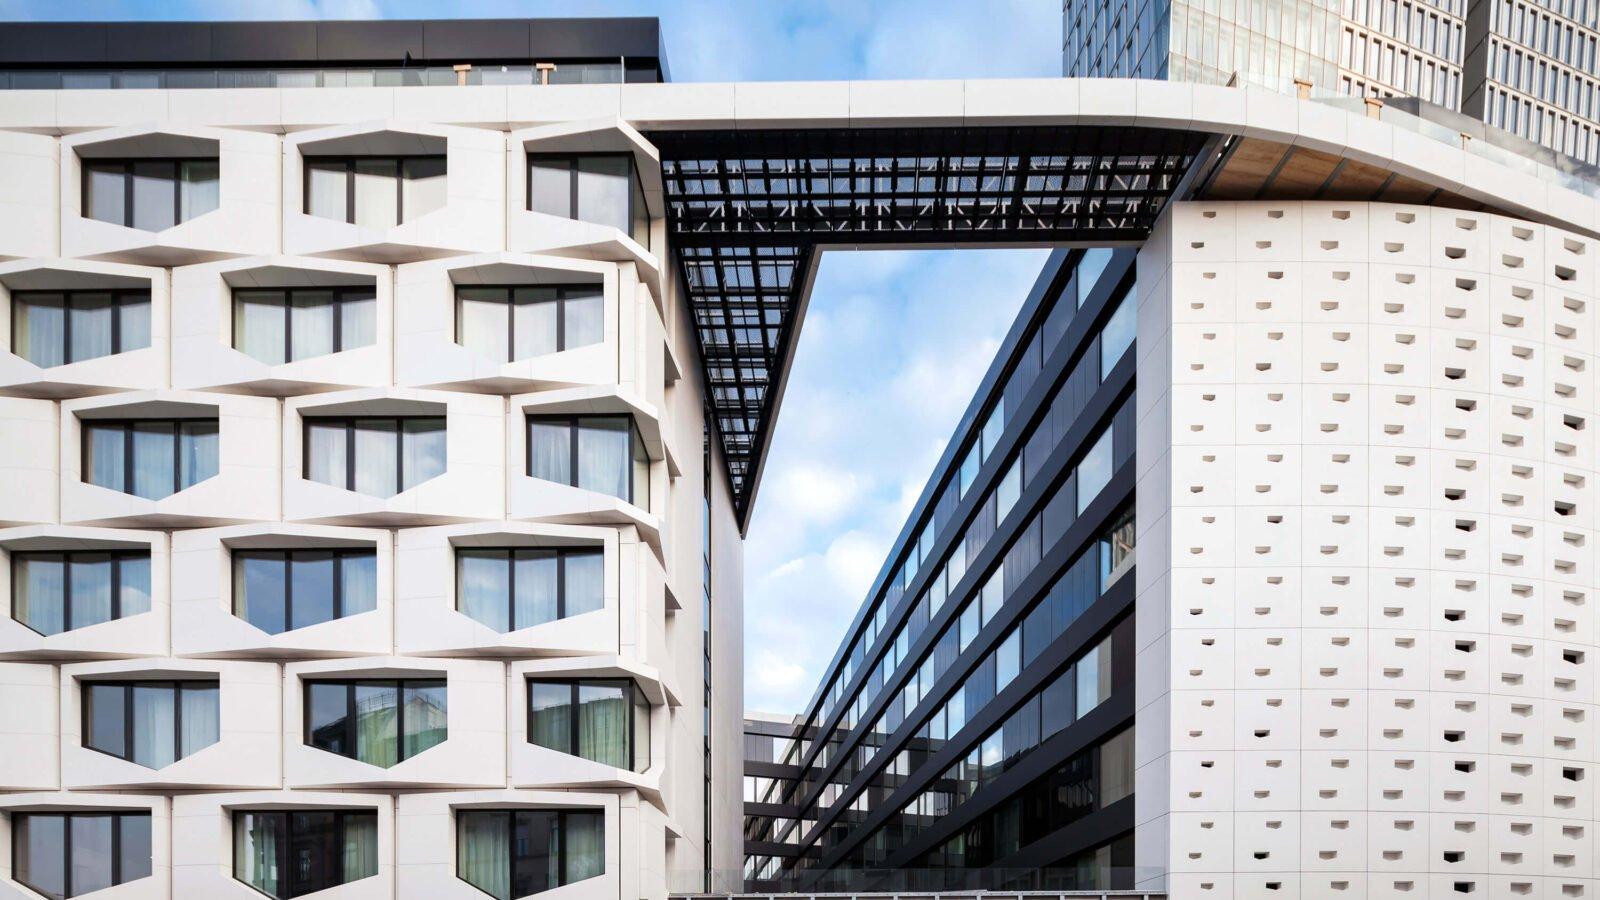 3 Building-Enhancing Facade Systems - Azure Magazine   Azure Magazine